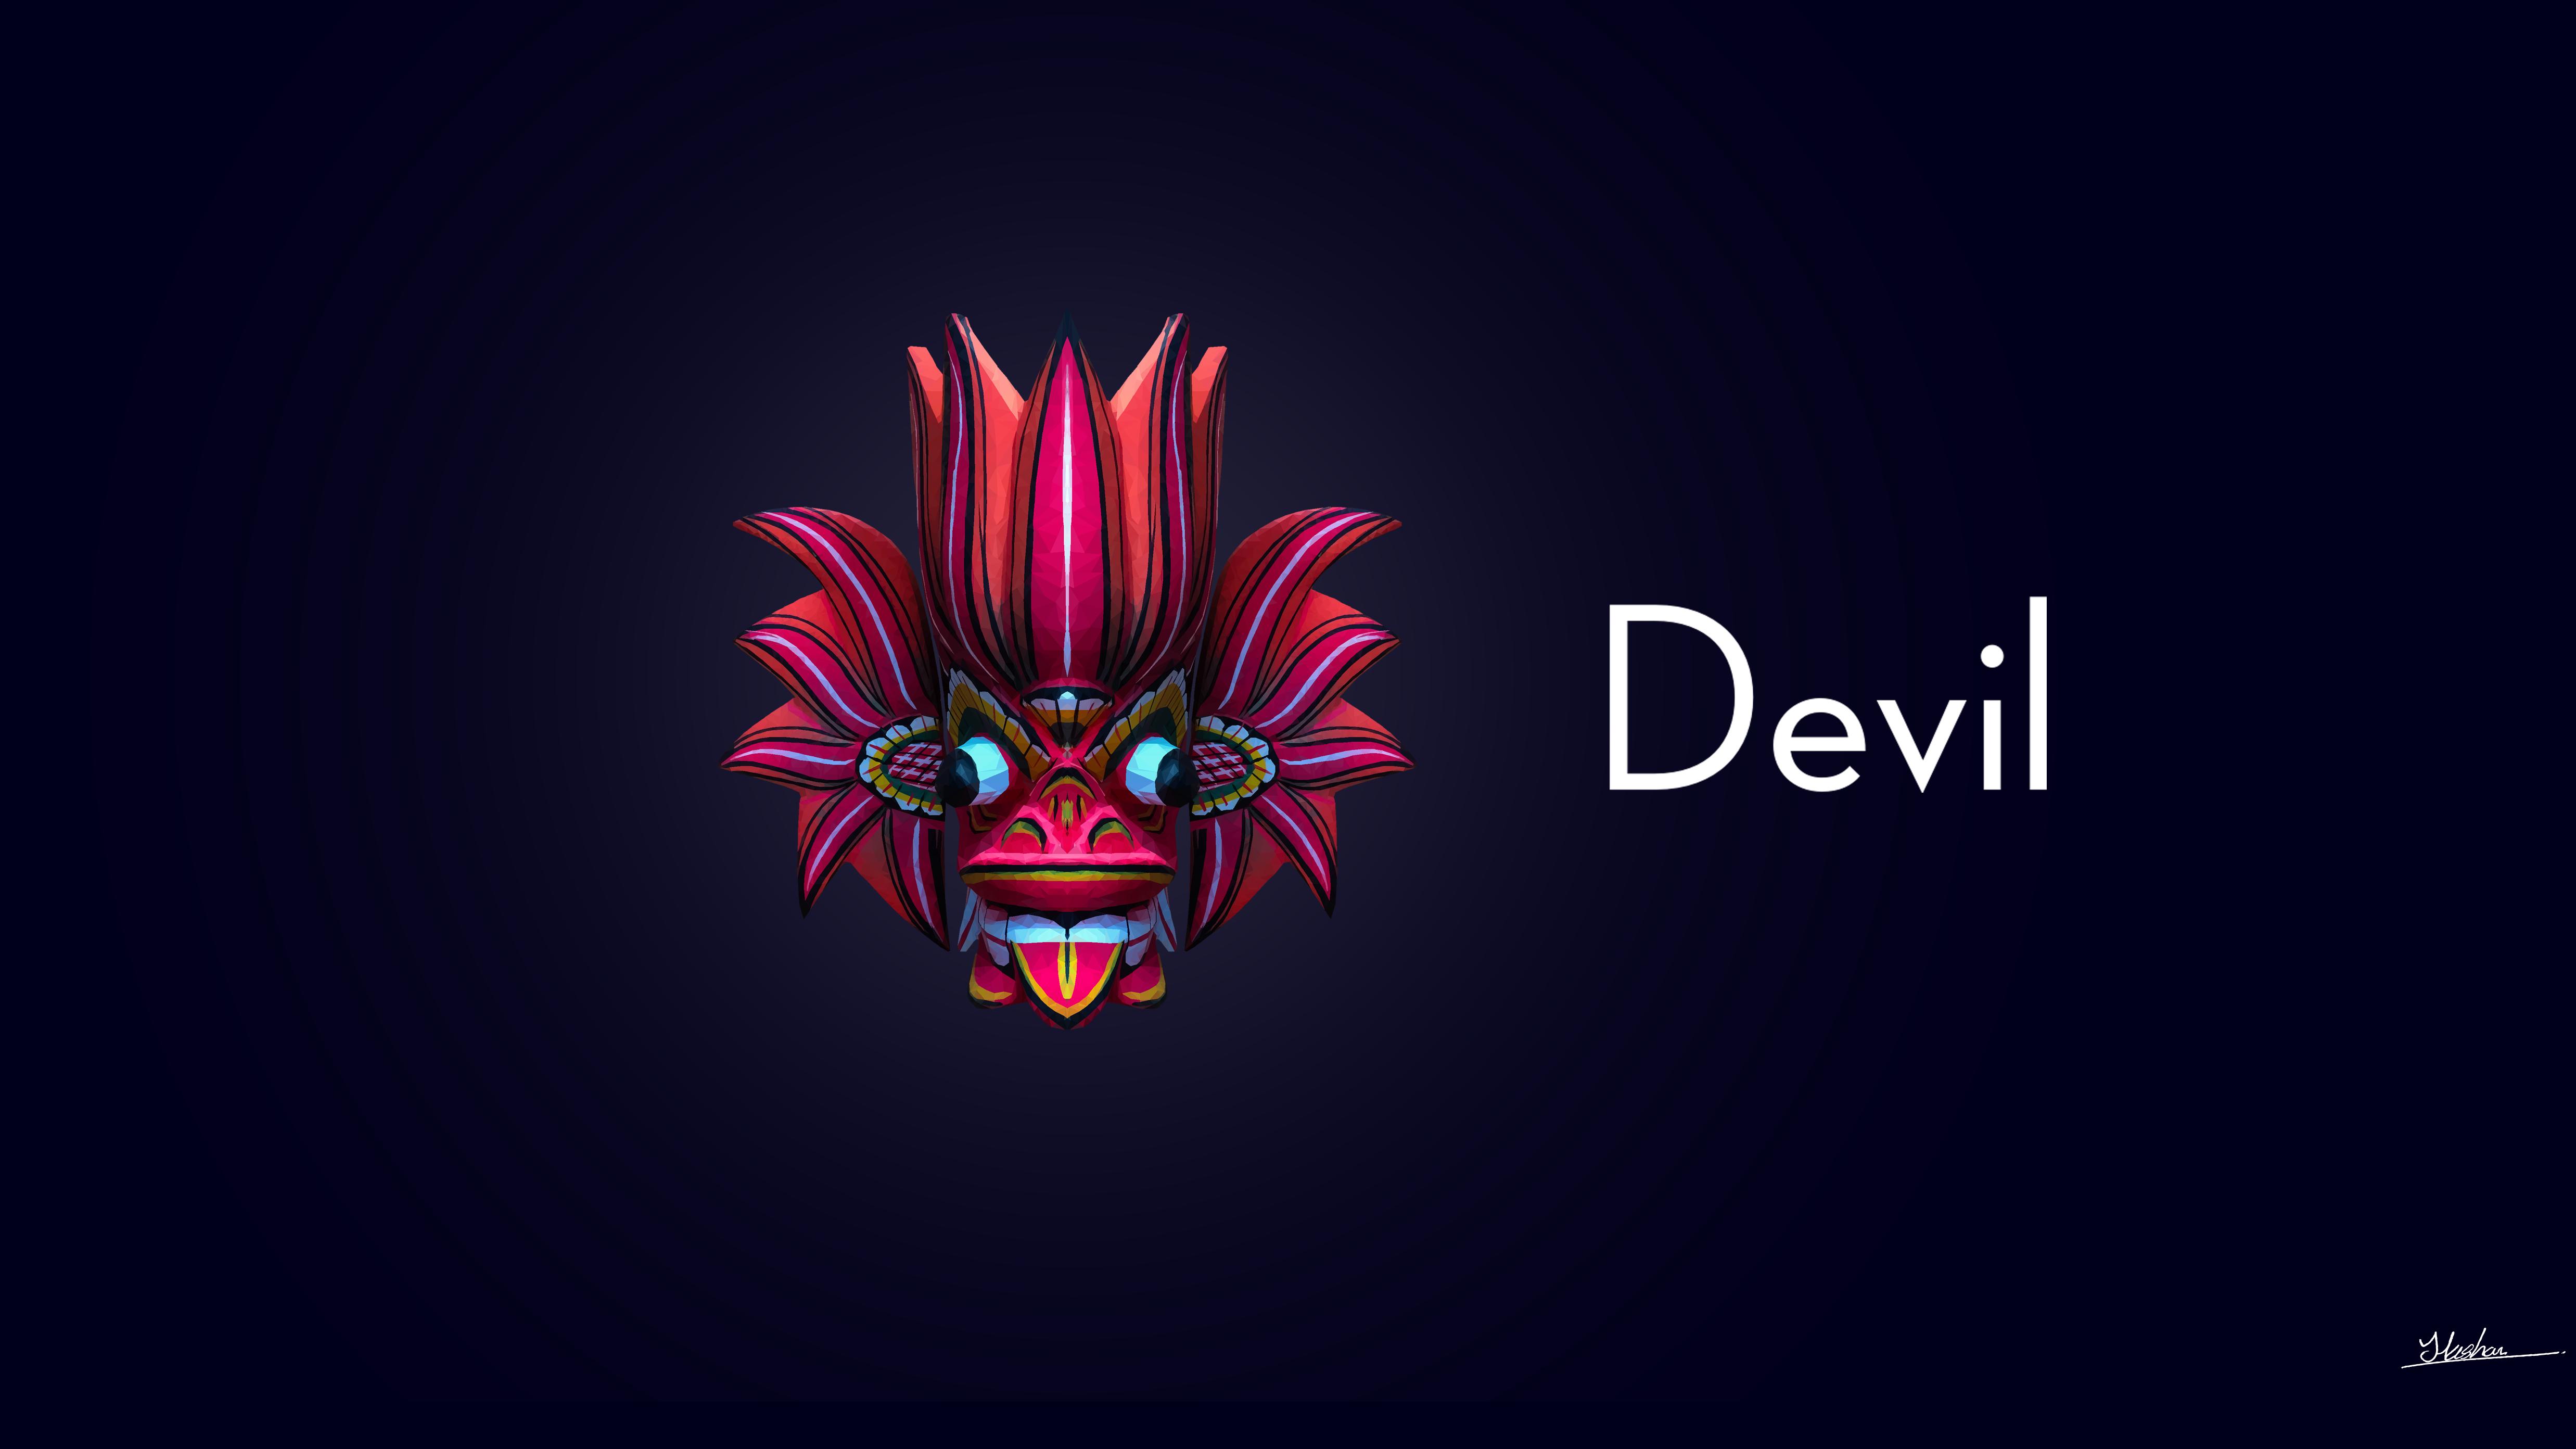 Sri Lankan Devil Mask 4k Ultra HD Wallpaper | Background ...